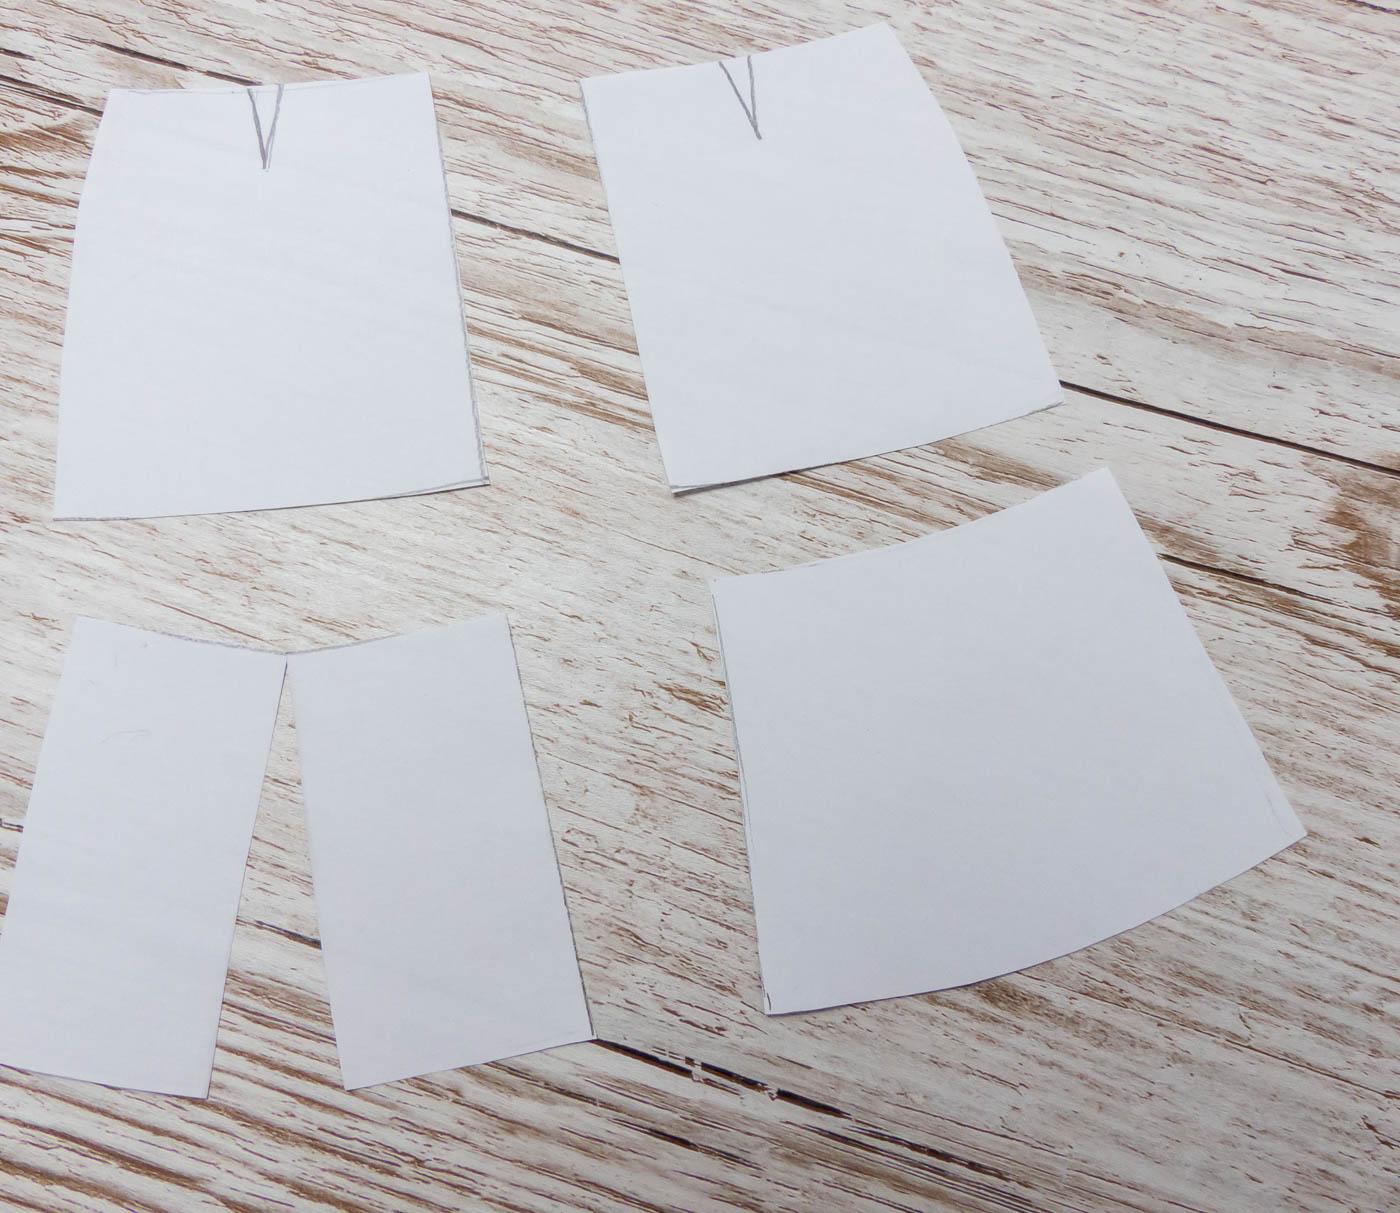 Faux Suede Skirt Pattern preparation